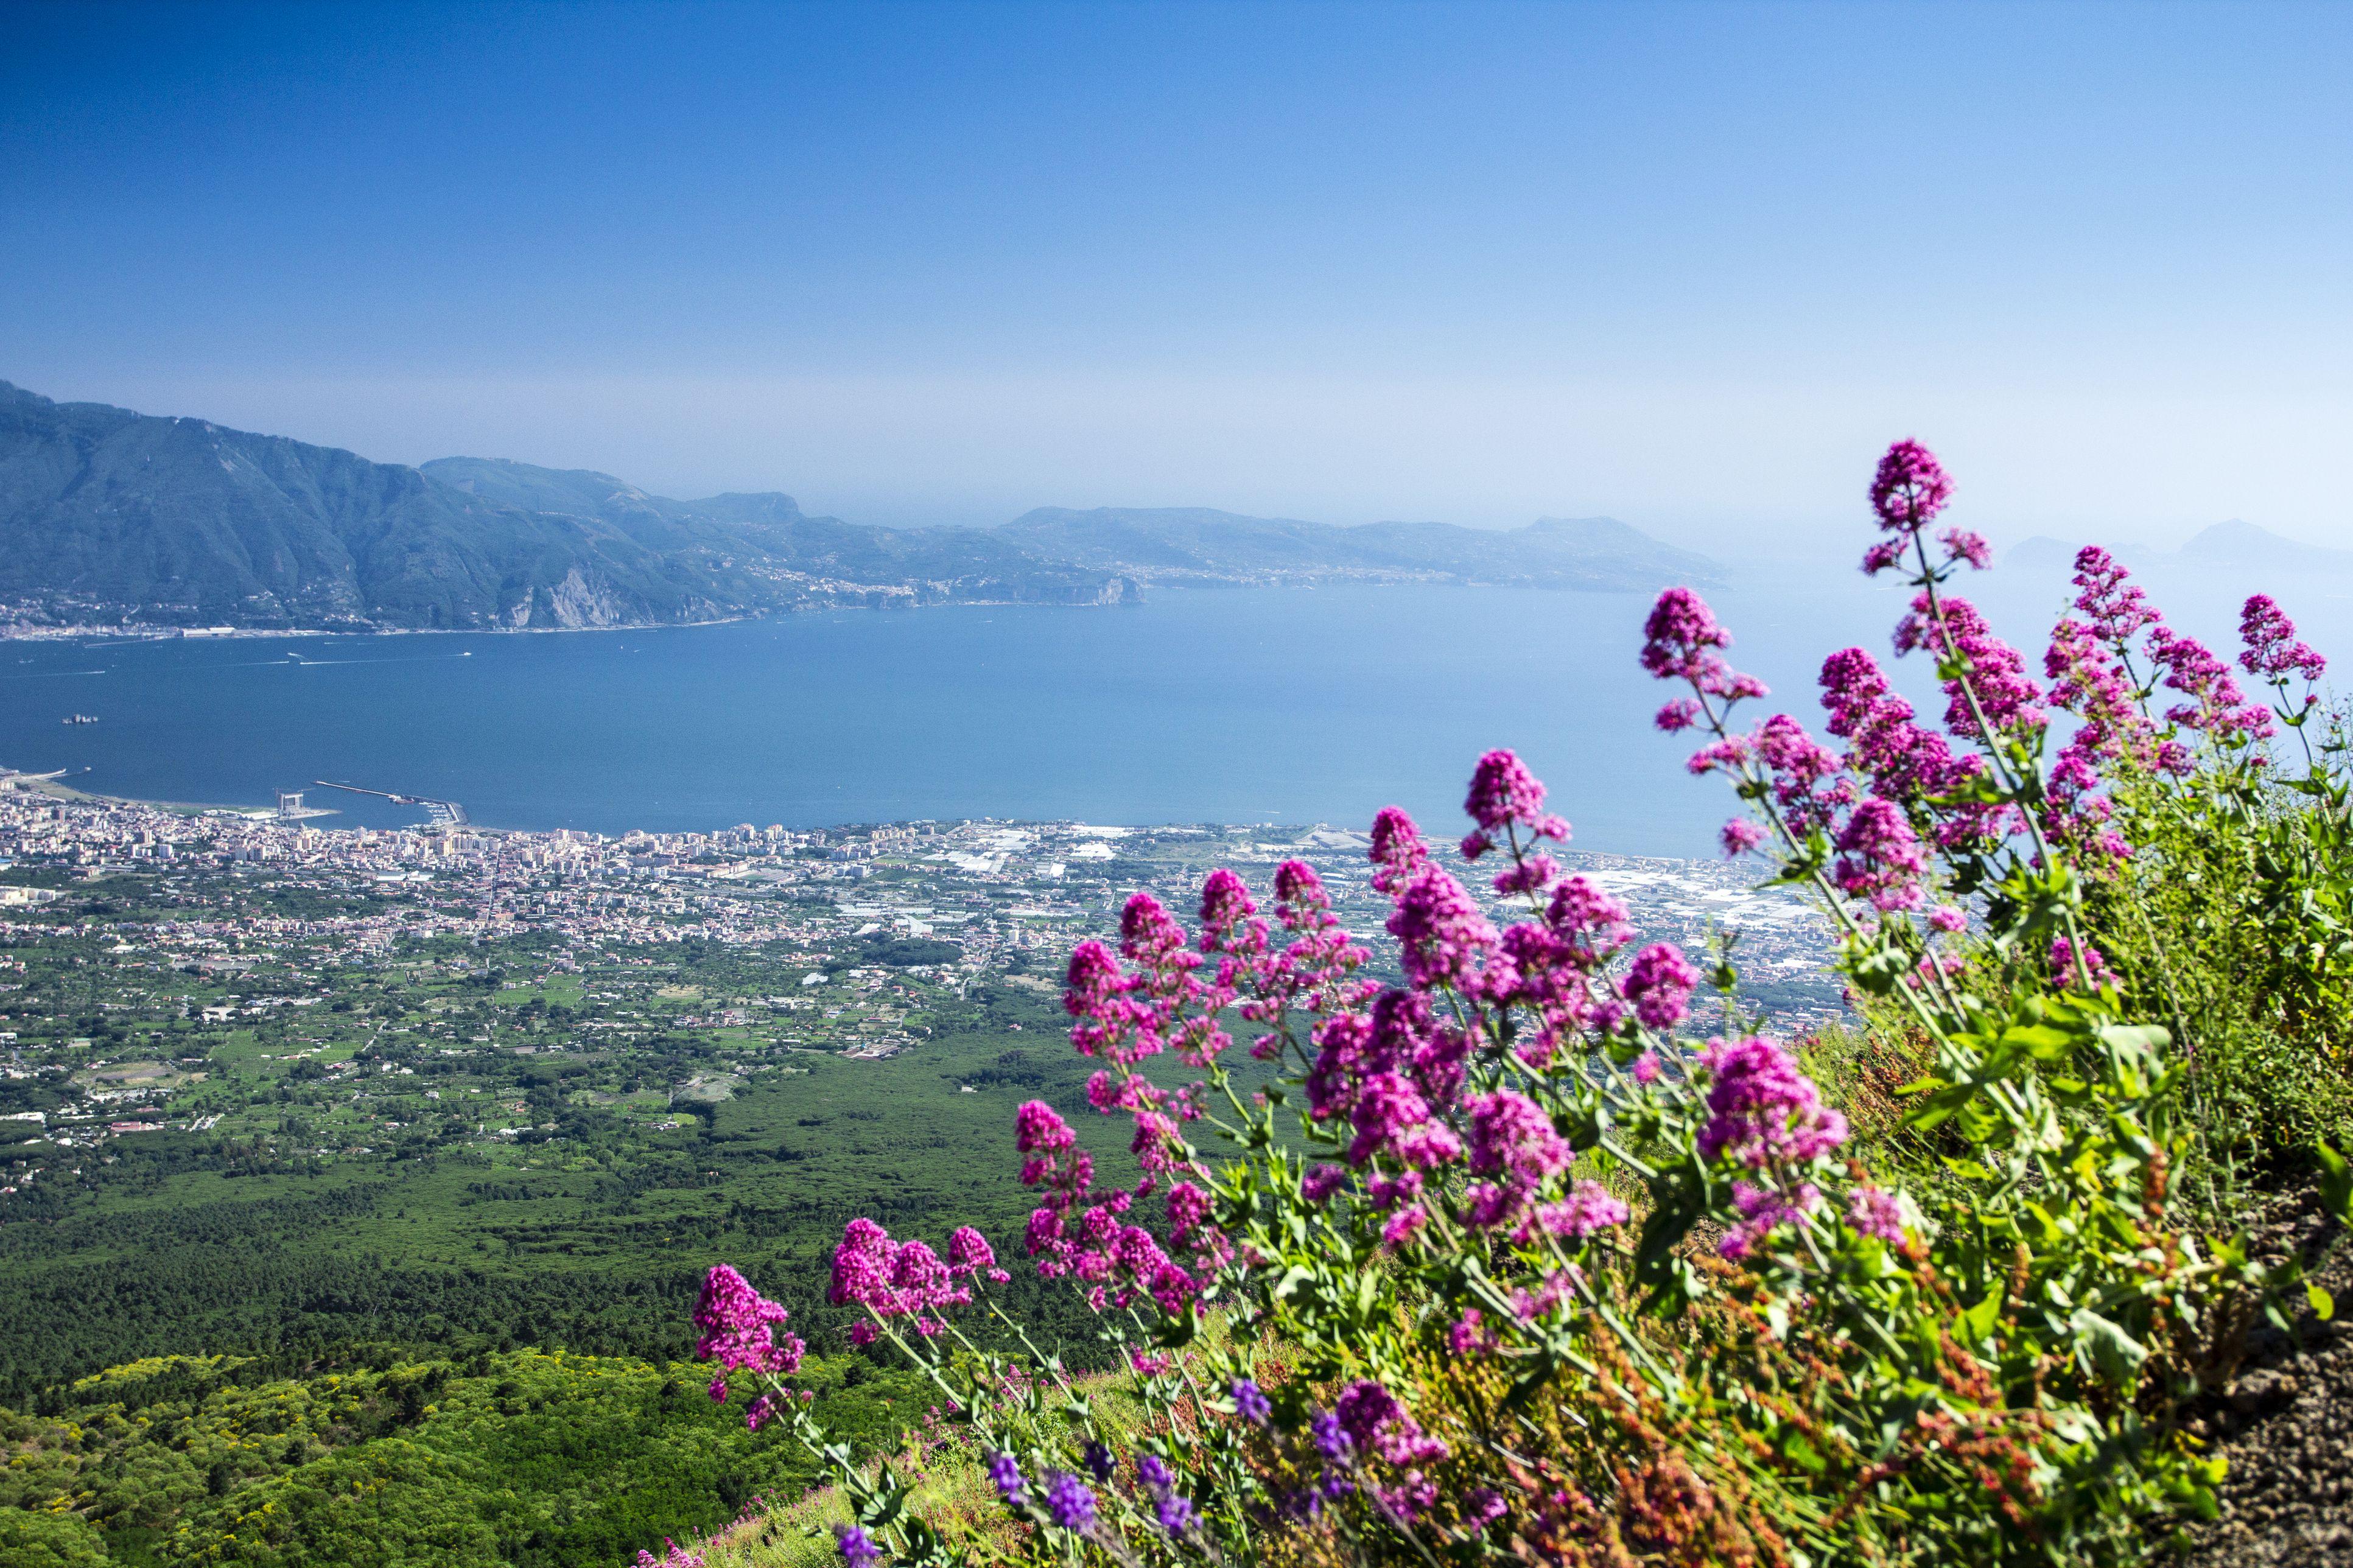 View from Mount Vesuvius to Sorrento